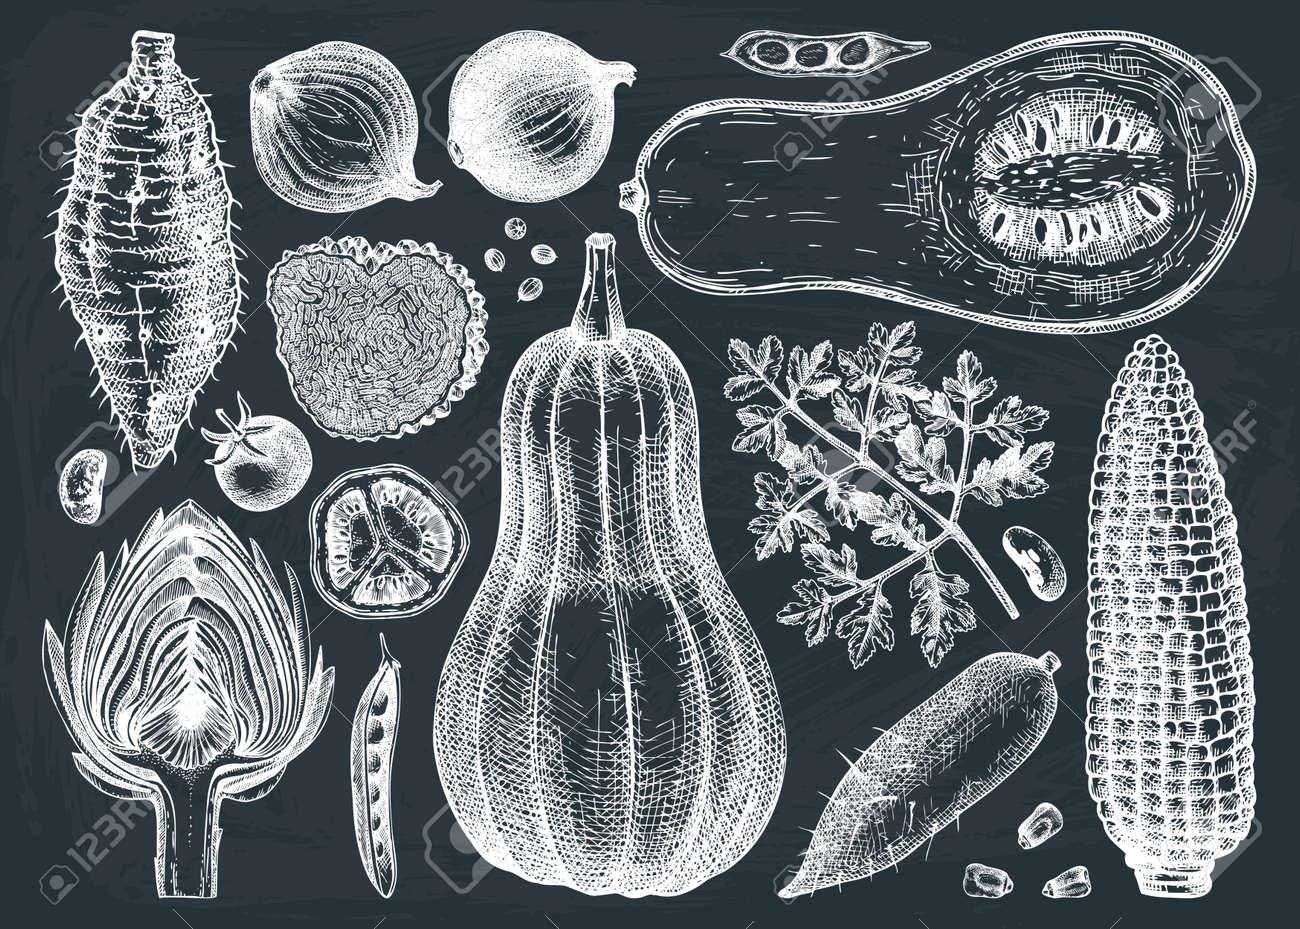 Seasonal vegetables vector drawings collection. Healthy food ingredients on chalkboard - vegetables, herbs, mushrooms illustration. Vintage kitchen set. Hand-sketched vegetables. - 170065495